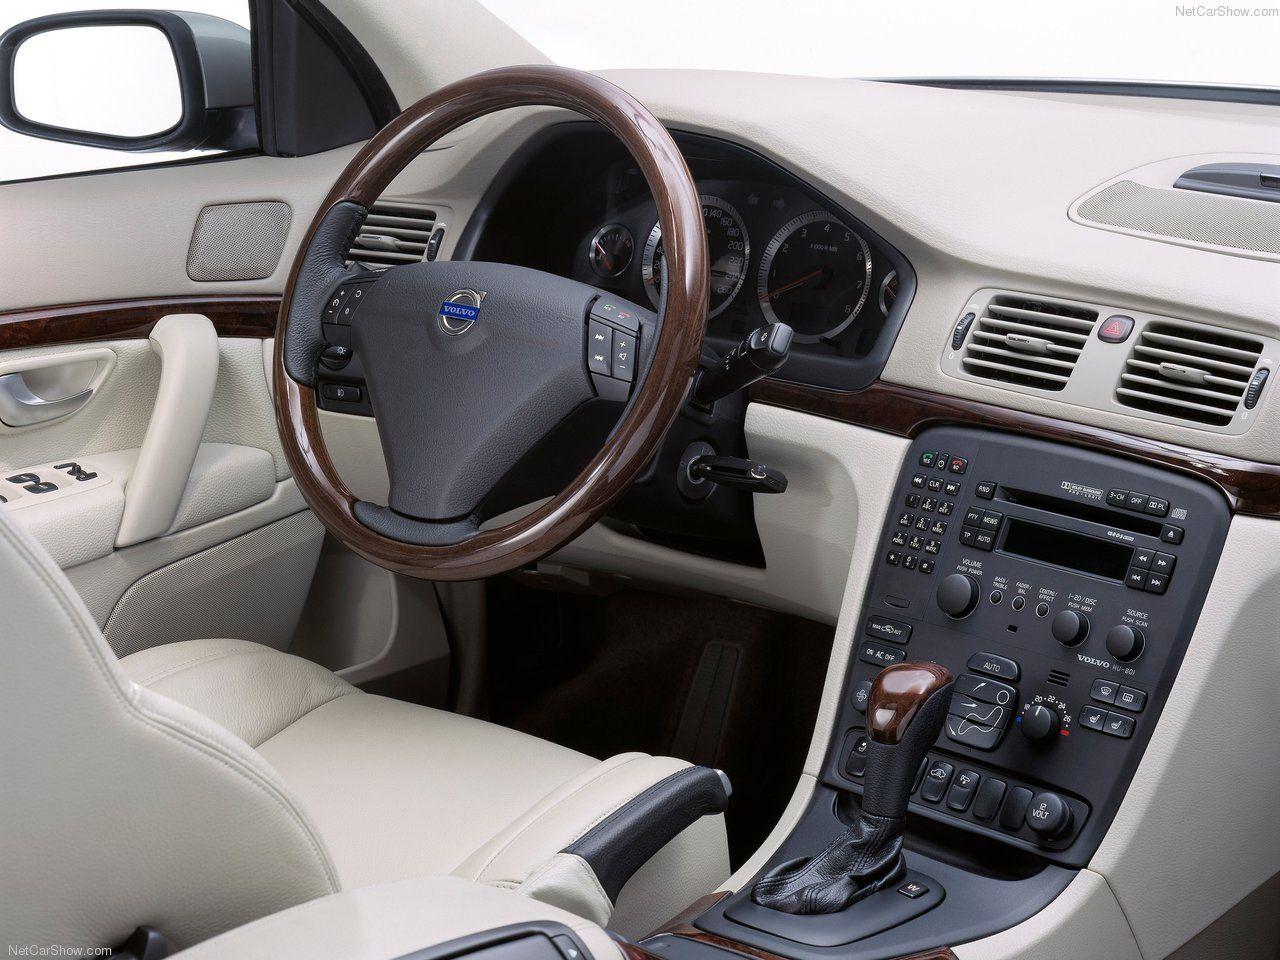 Image result for volvo s80 interior press photos | Volvo ...